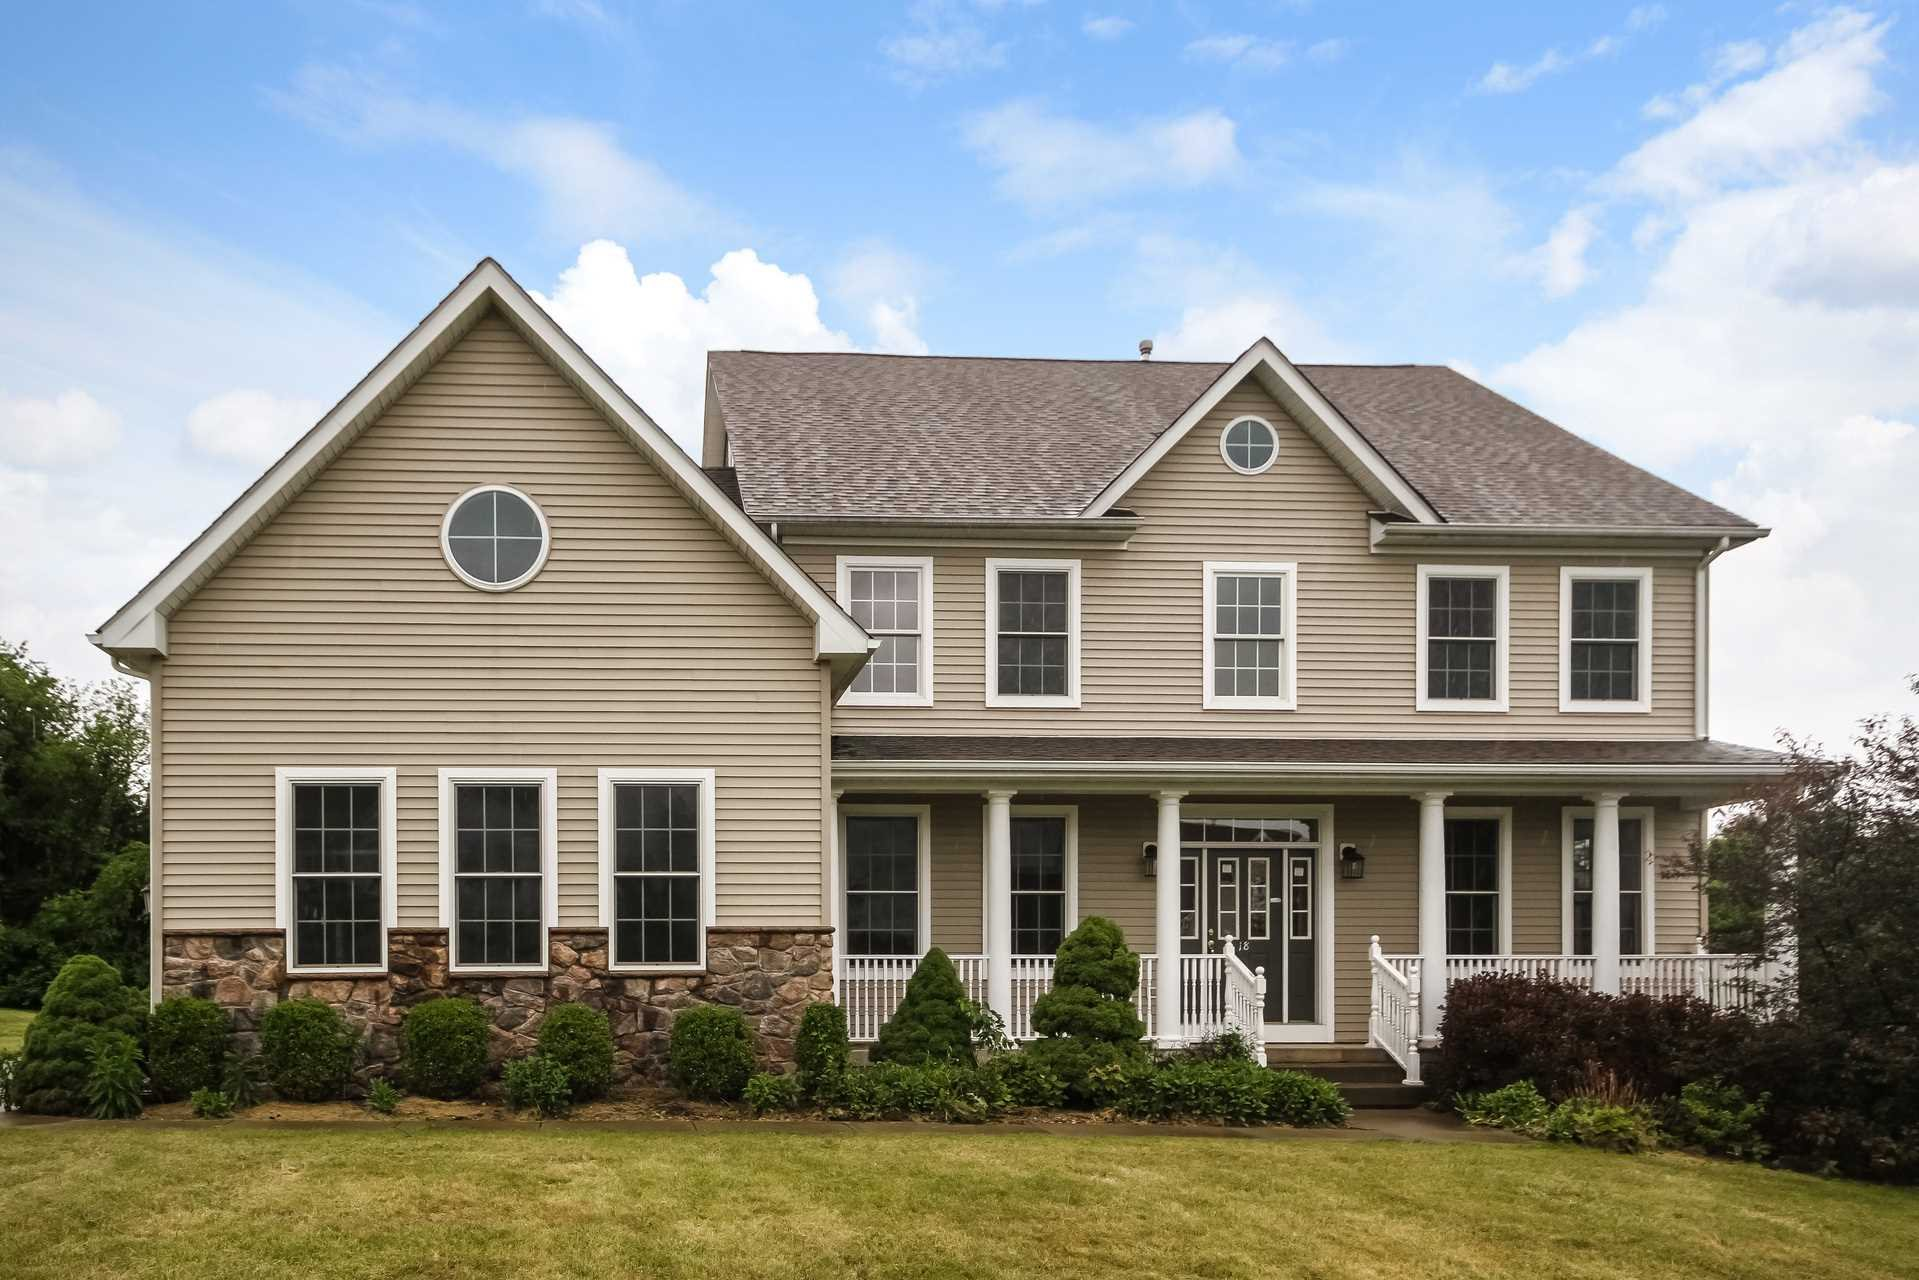 Single Family Home for Sale at 18 RIDGELINE Drive 18 RIDGELINE Drive Poughkeepsie, New York 12603 United States